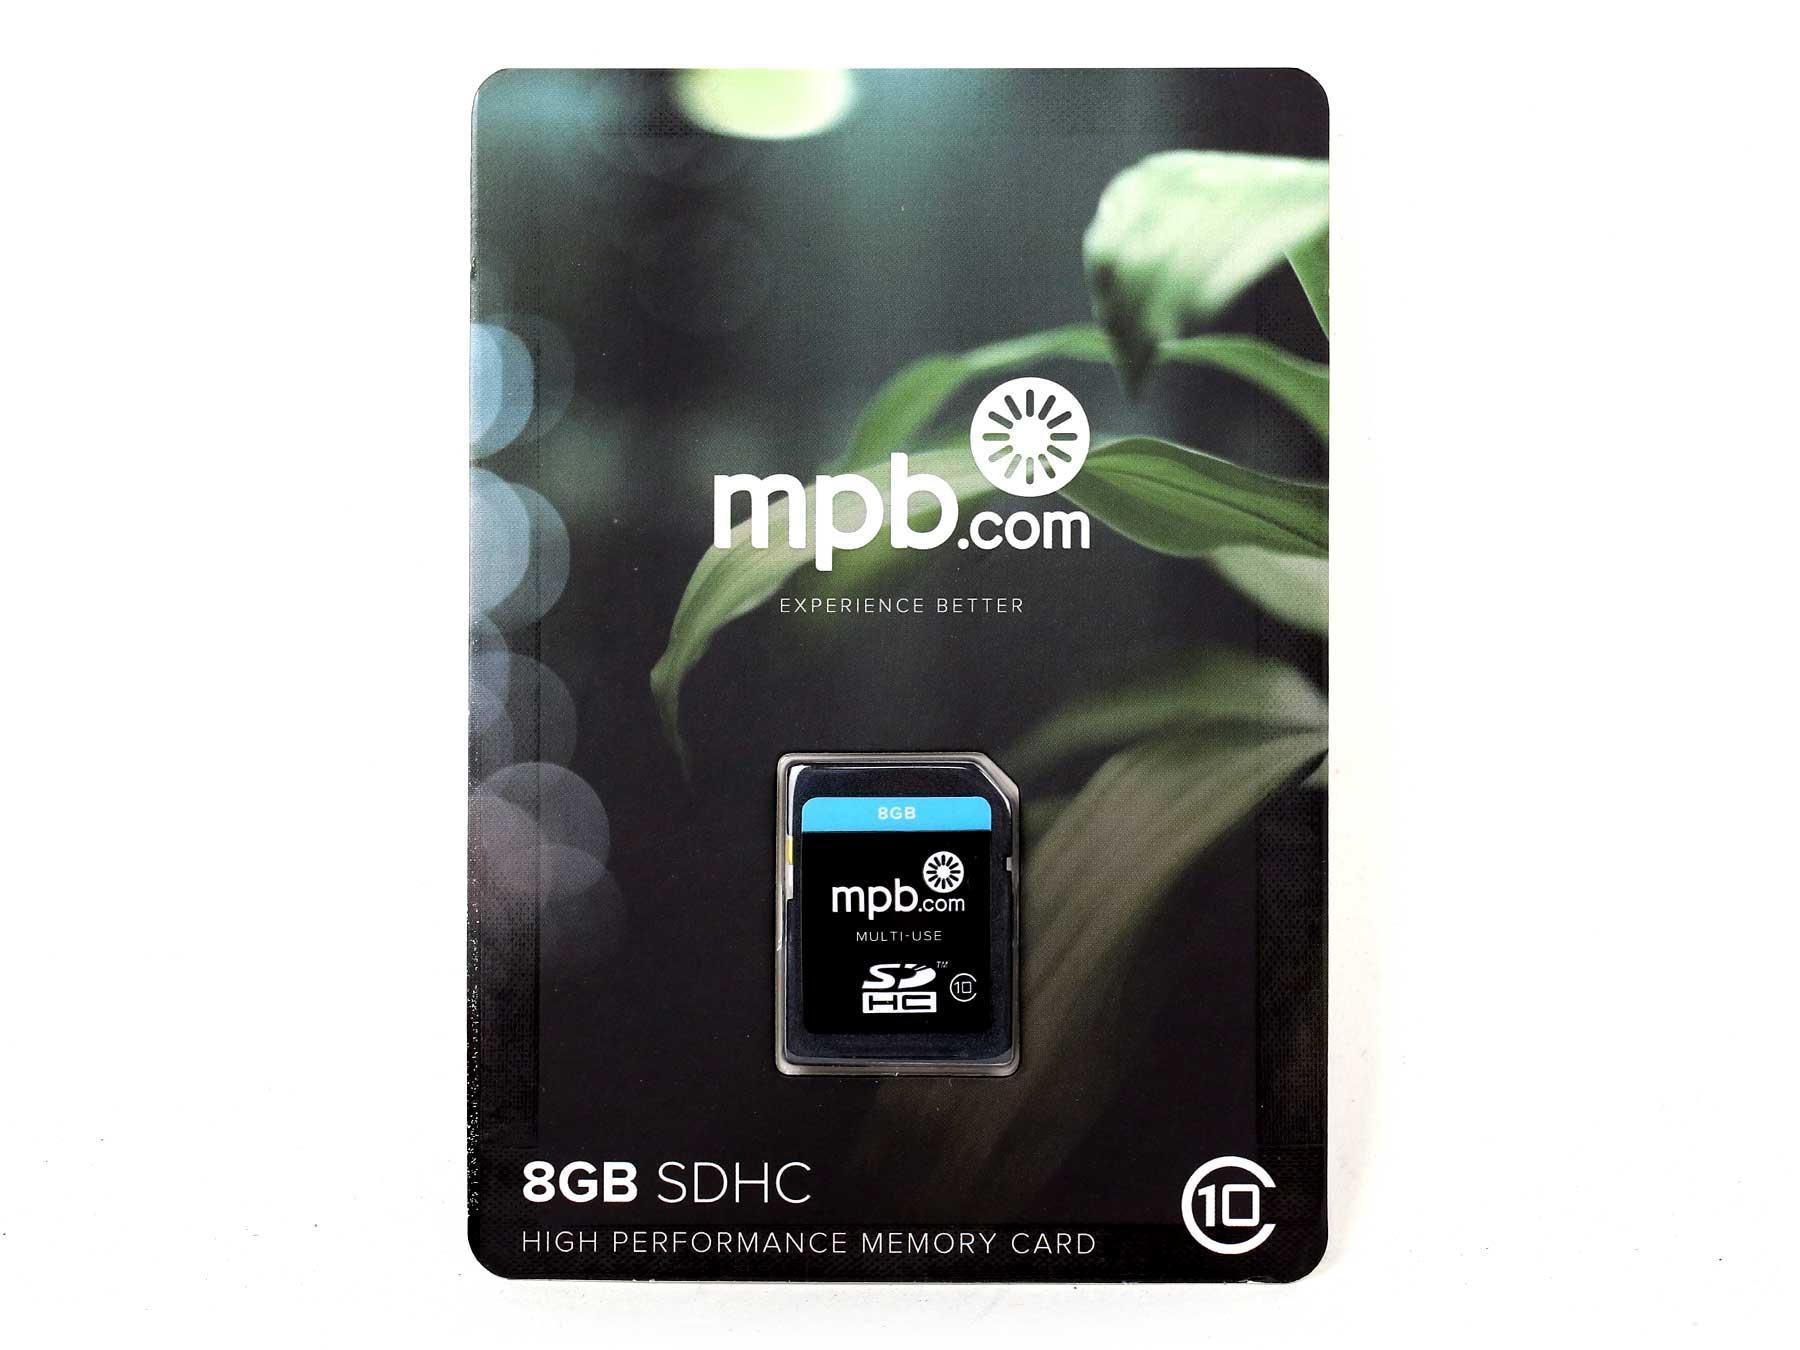 mpbmemorycard image